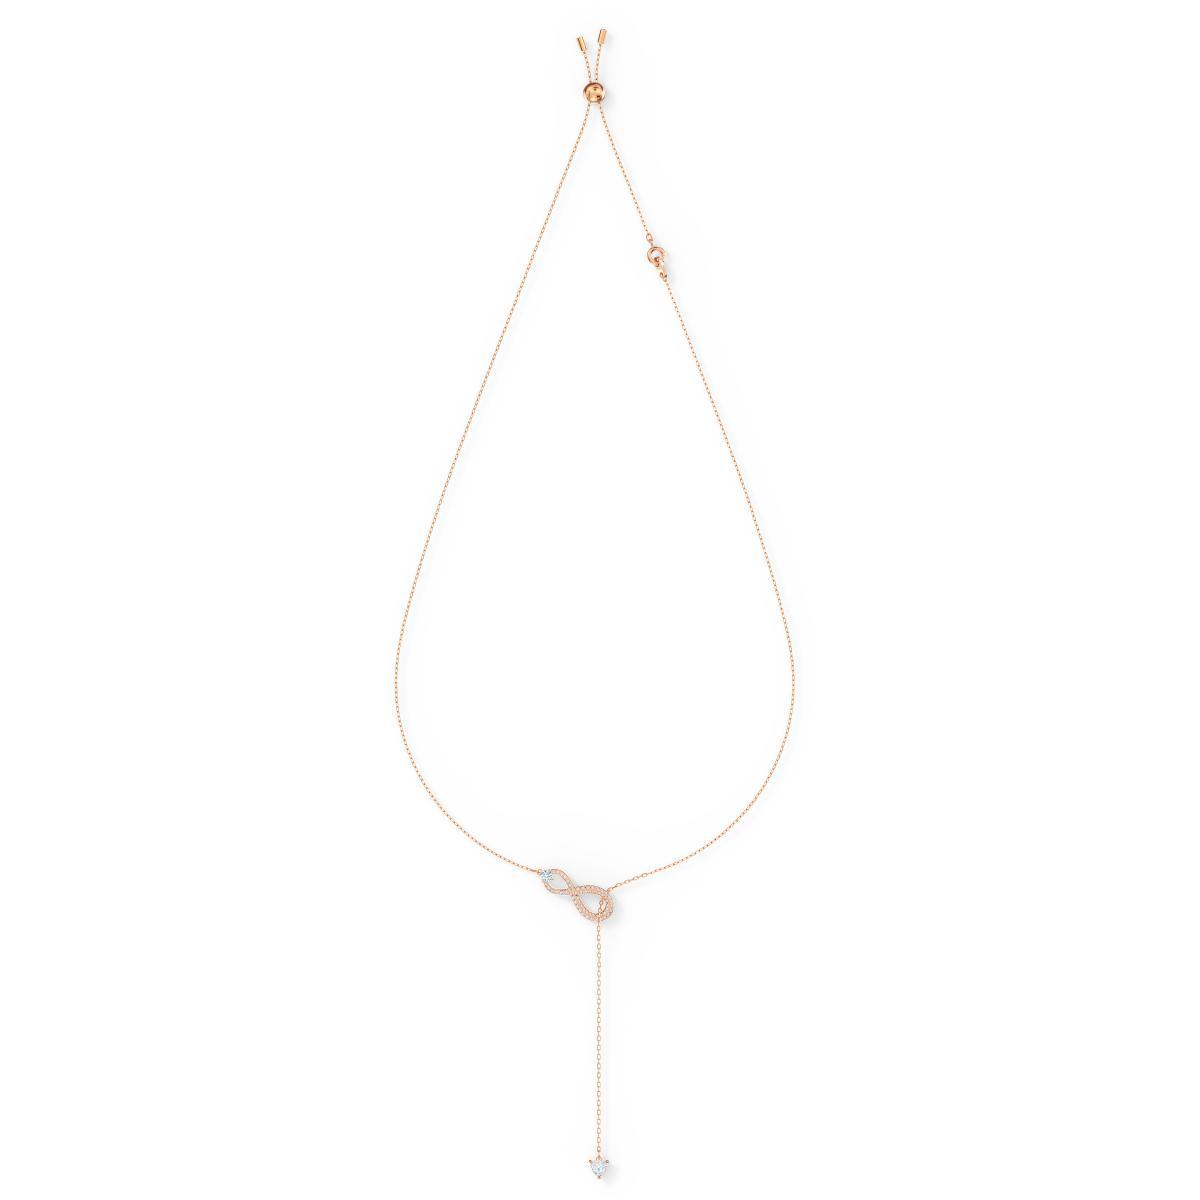 Collier Swarovski 5521346 - Collier doré pendentif infini et chaine Femme